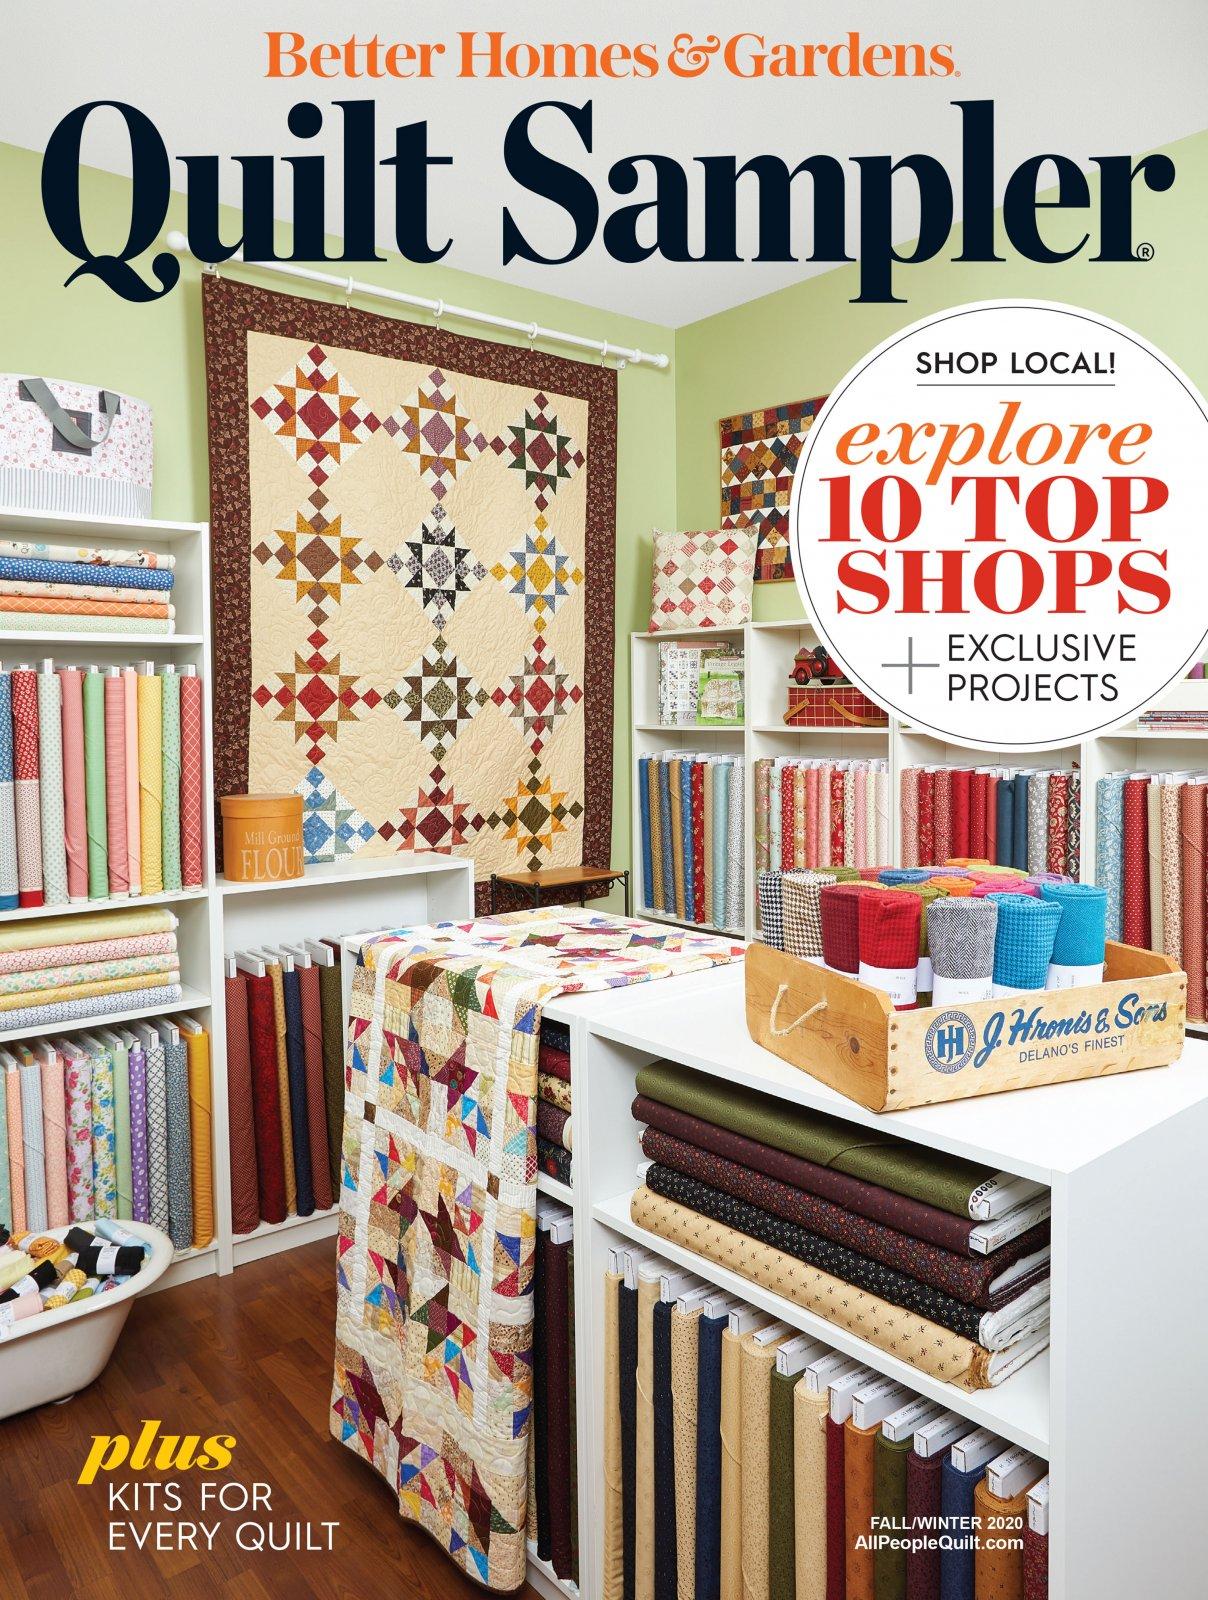 Quilt Sampler Fall/Winter 2020